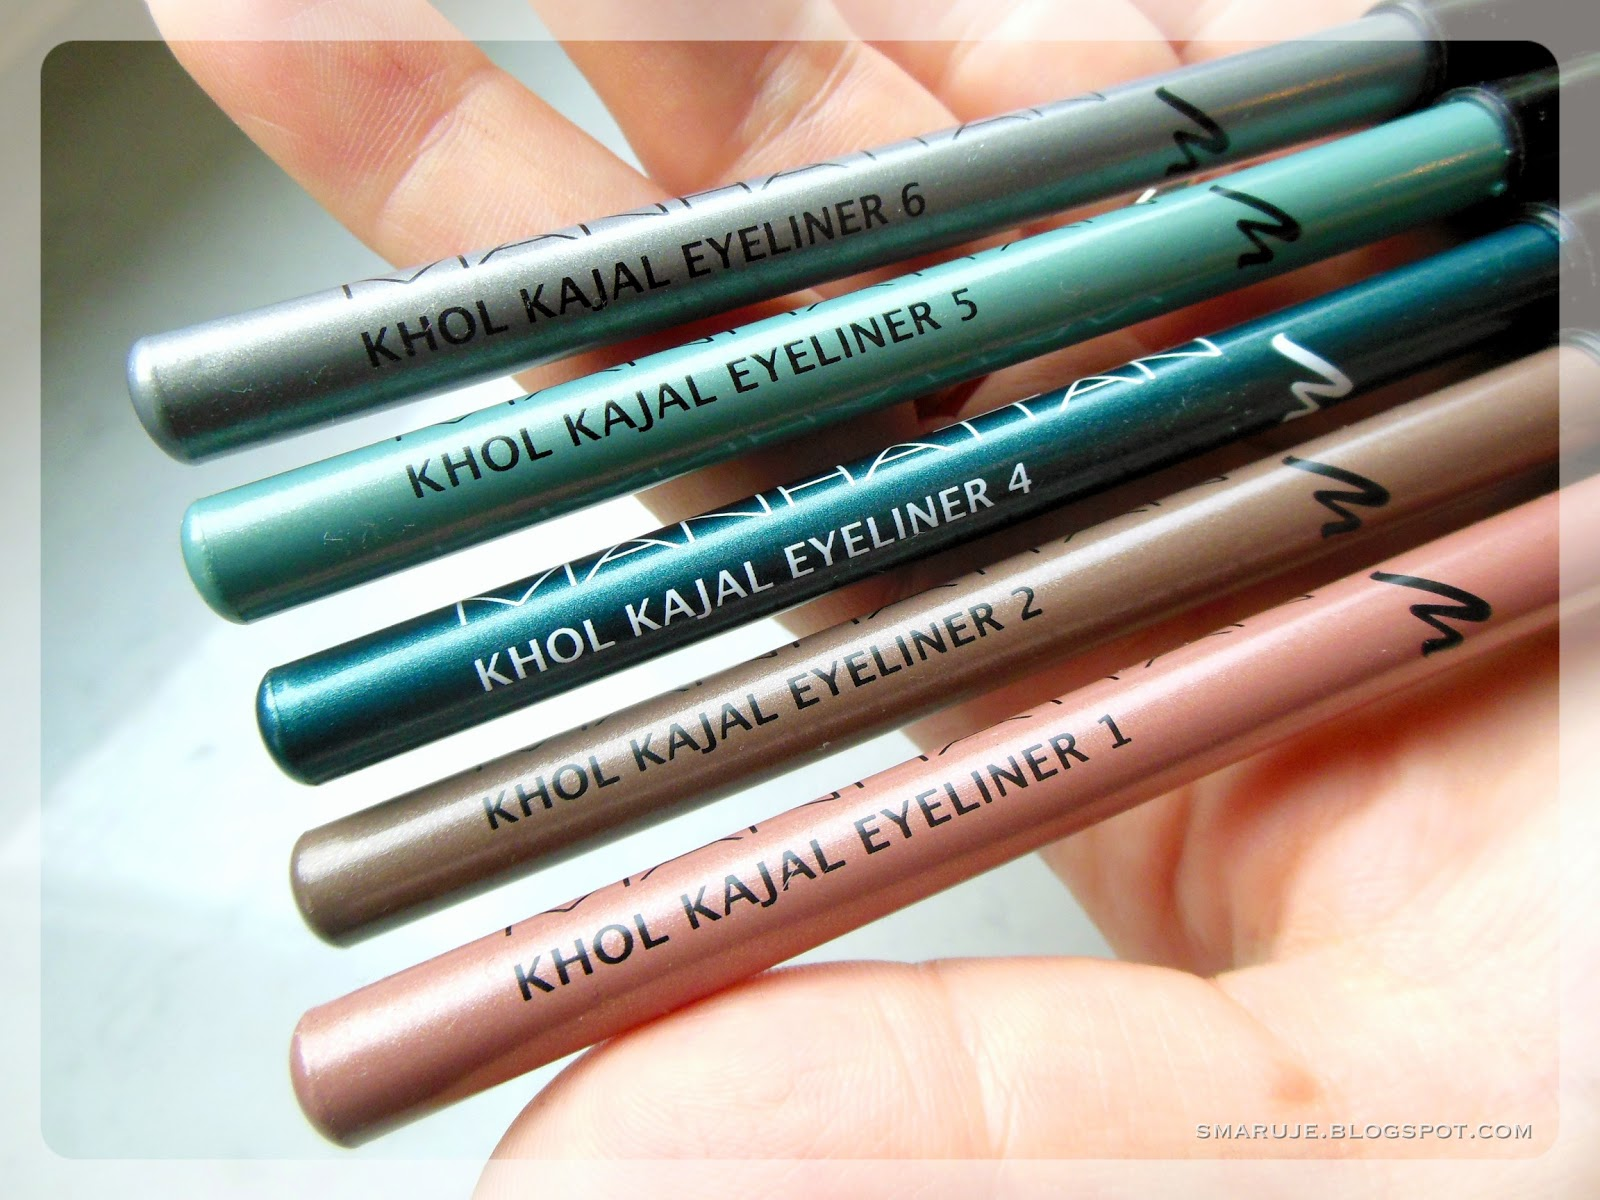 Manhattan – Khol Kajal Eyeliner, czyli kredki do oczu za grosze